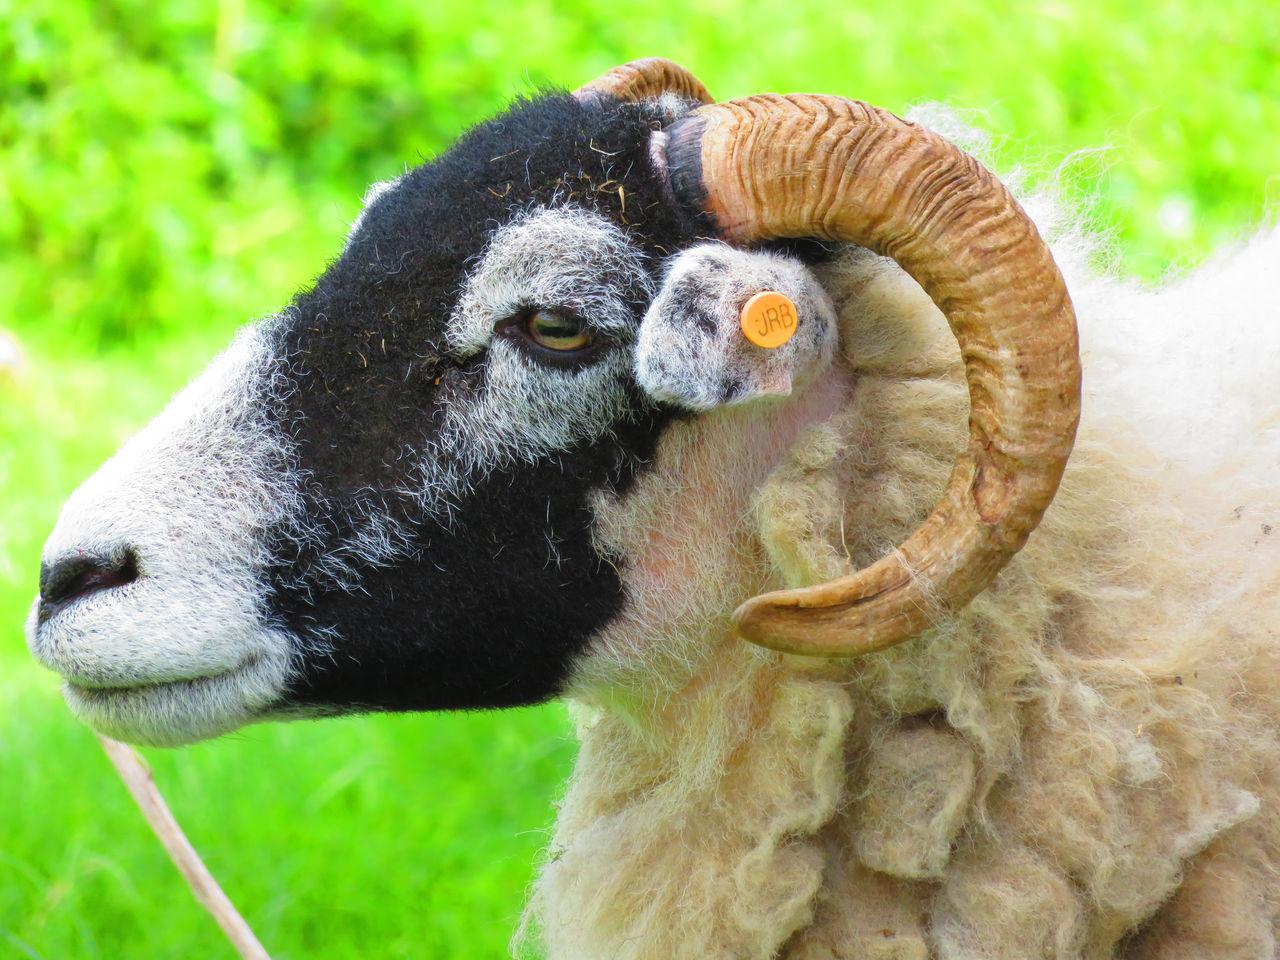 Grassington Livestock Sheep Sheep Farm Sheep Meadow Sheeps Sheep🐑 Sheep Ranch Animal Photography Farm Life Sheep And Lambs Farm Animal Close Up Farm Animal EyeEm Animal Lover Farm Animals Sheepfarm Sheep Grazing Farmanimals EyeEm Best Shots EyeEmBestPics Animal Head  Yorkshire Dales Yorkshire Yorkshiredales Yorkshire Countryside